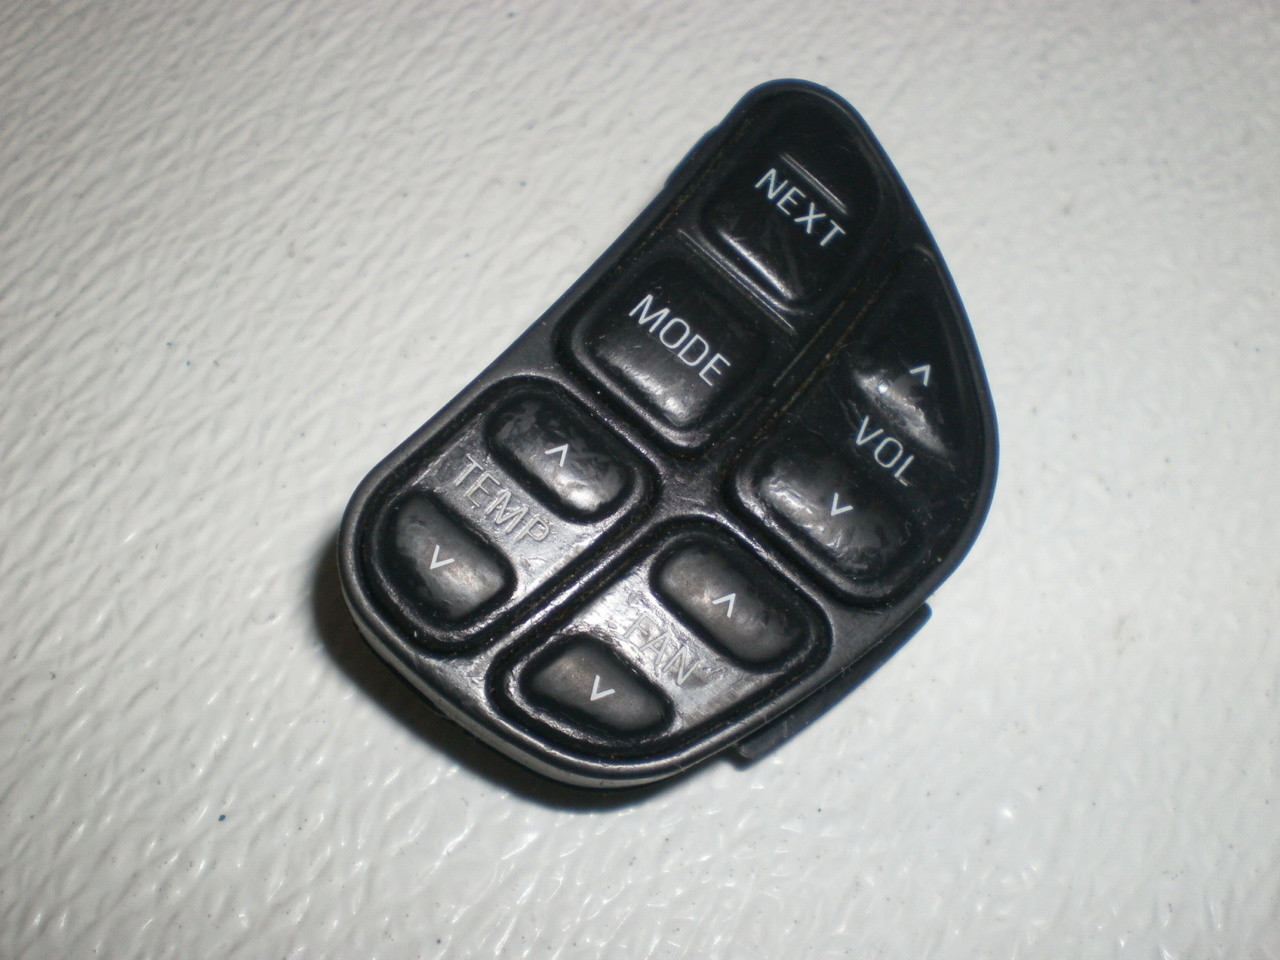 1997 2001 Ford Explorer Mountaineer Steering Wheel Switch Heater Radio Volume Control Right Analog F80f 18c844 Ba